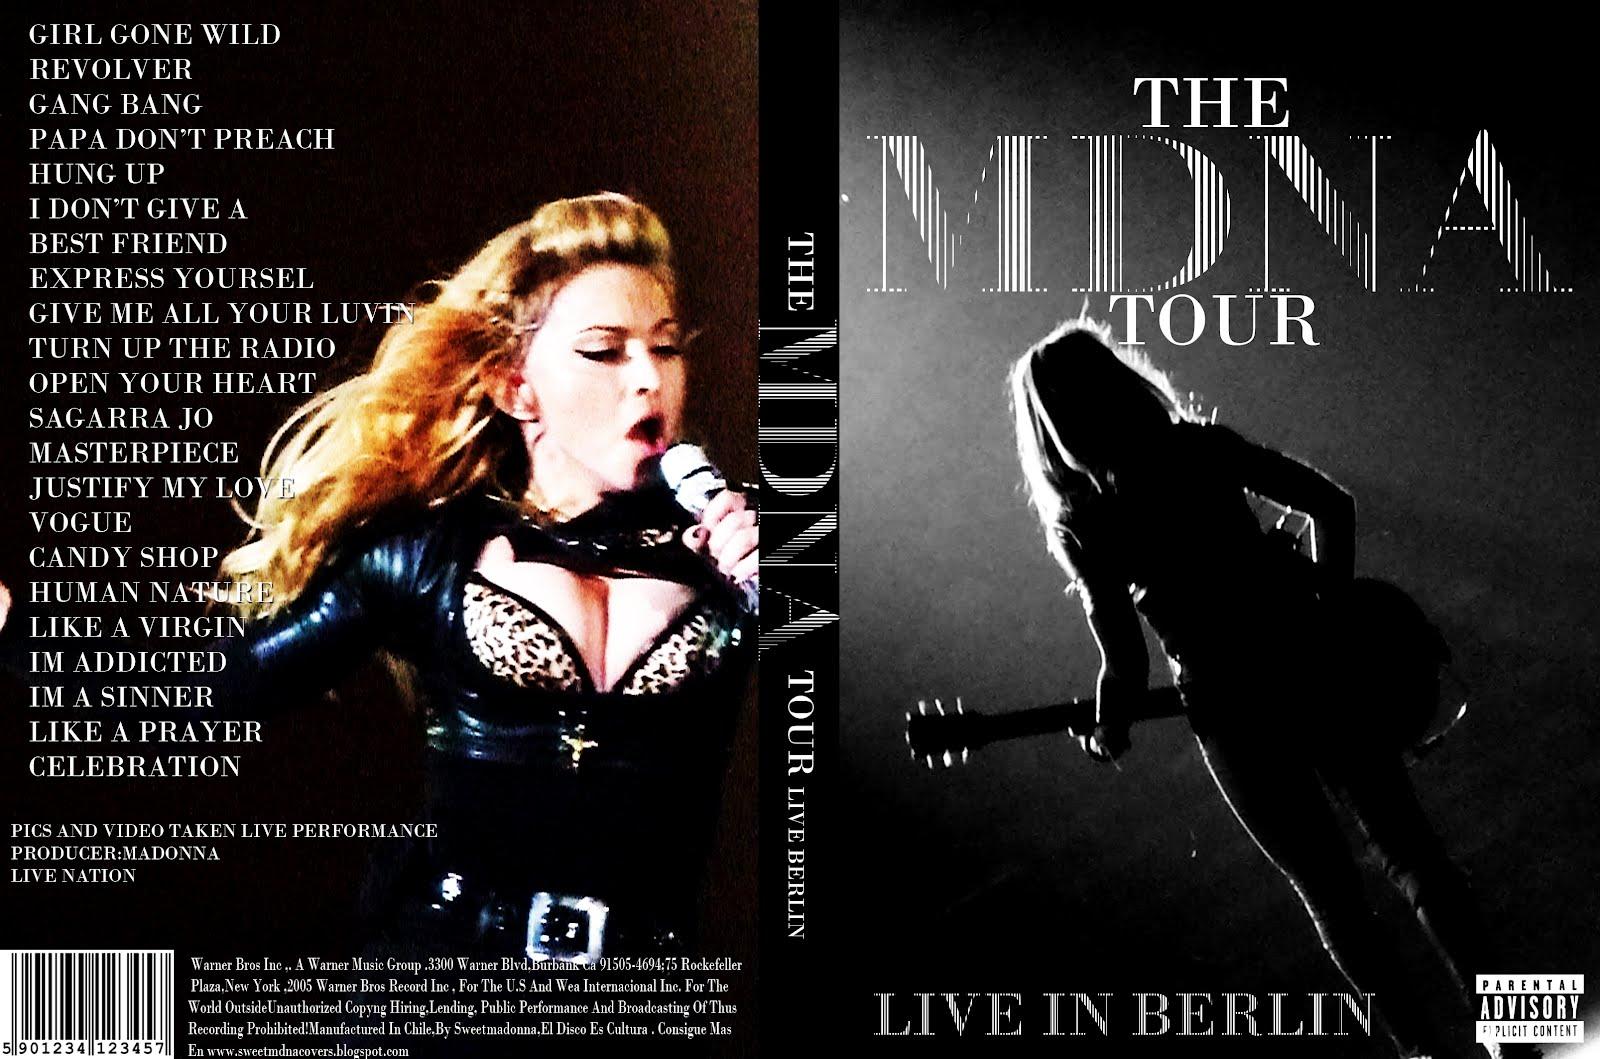 http://3.bp.blogspot.com/-gzaEP-9WvM0/UCE6UGF_LCI/AAAAAAAAMho/8rSux9SmIzw/s1600/MDNA+Tour+Berlin+DVD+by+SweetMDNAcovers.jpg